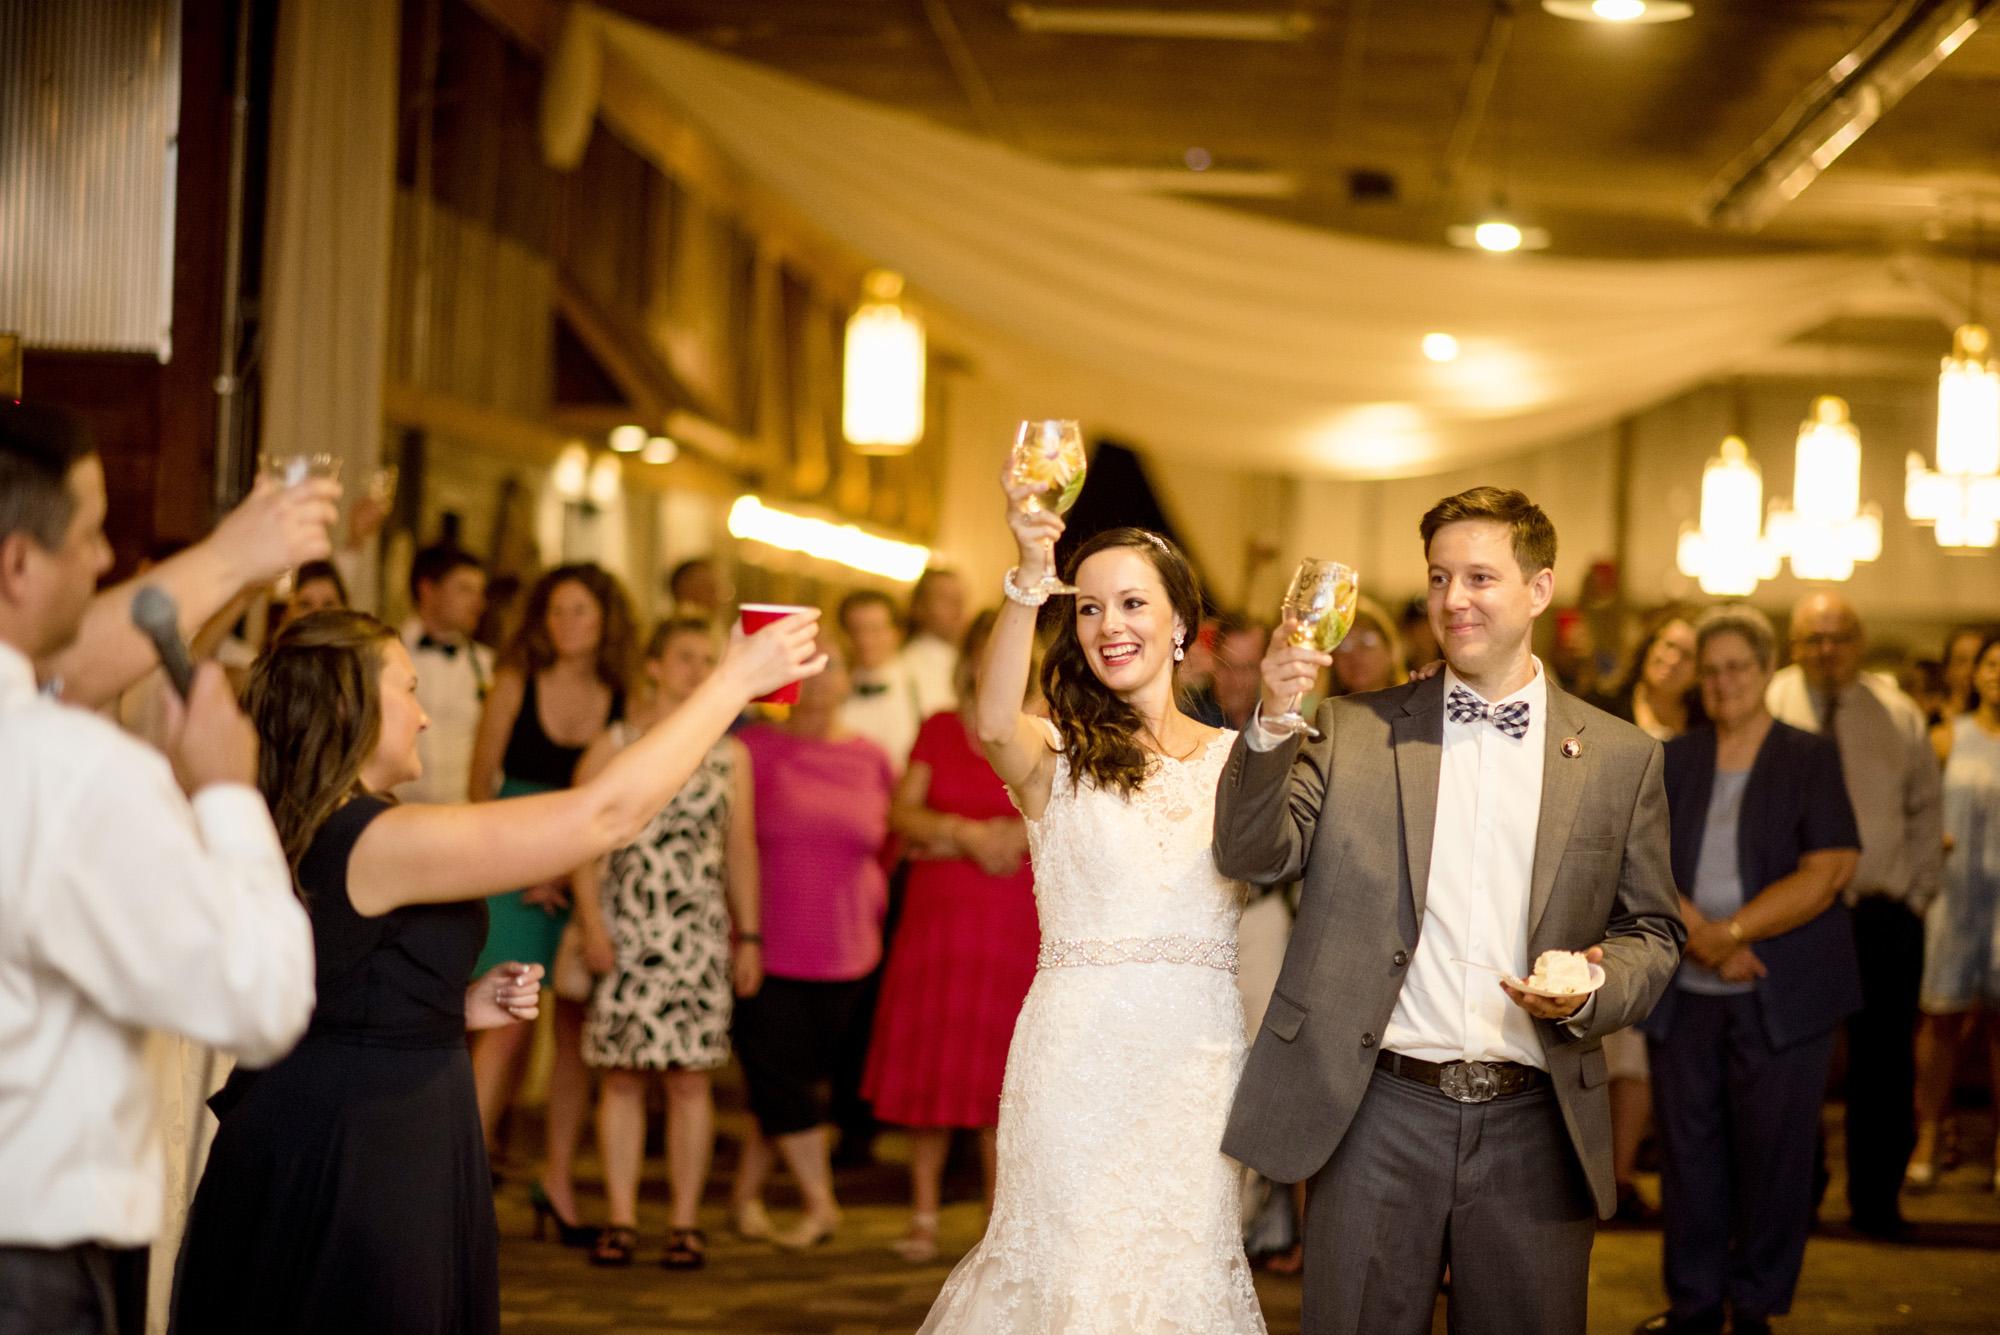 Seriously_Sabrina_Photography_Bowling_Green_Kentucky_Highland_Stables_Wedding_Wolff156.jpg